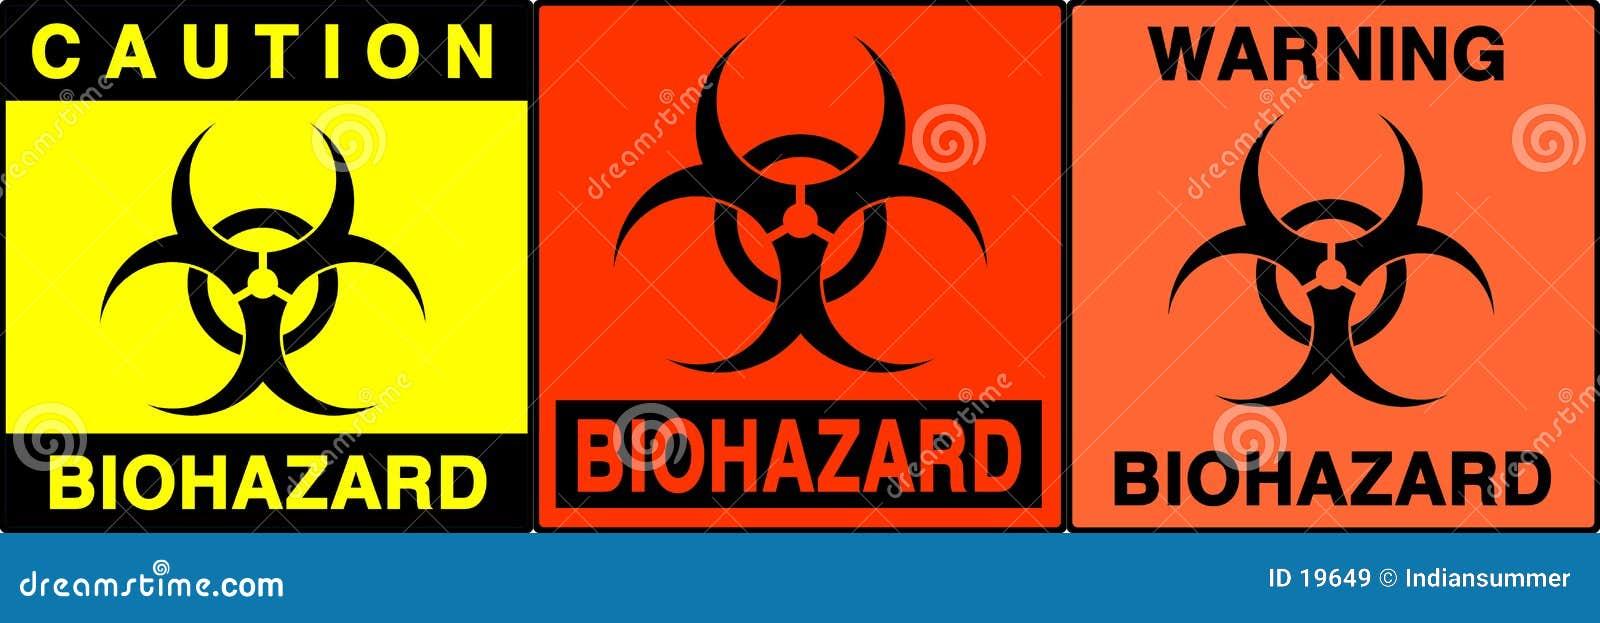 Caution/warning signs set, II